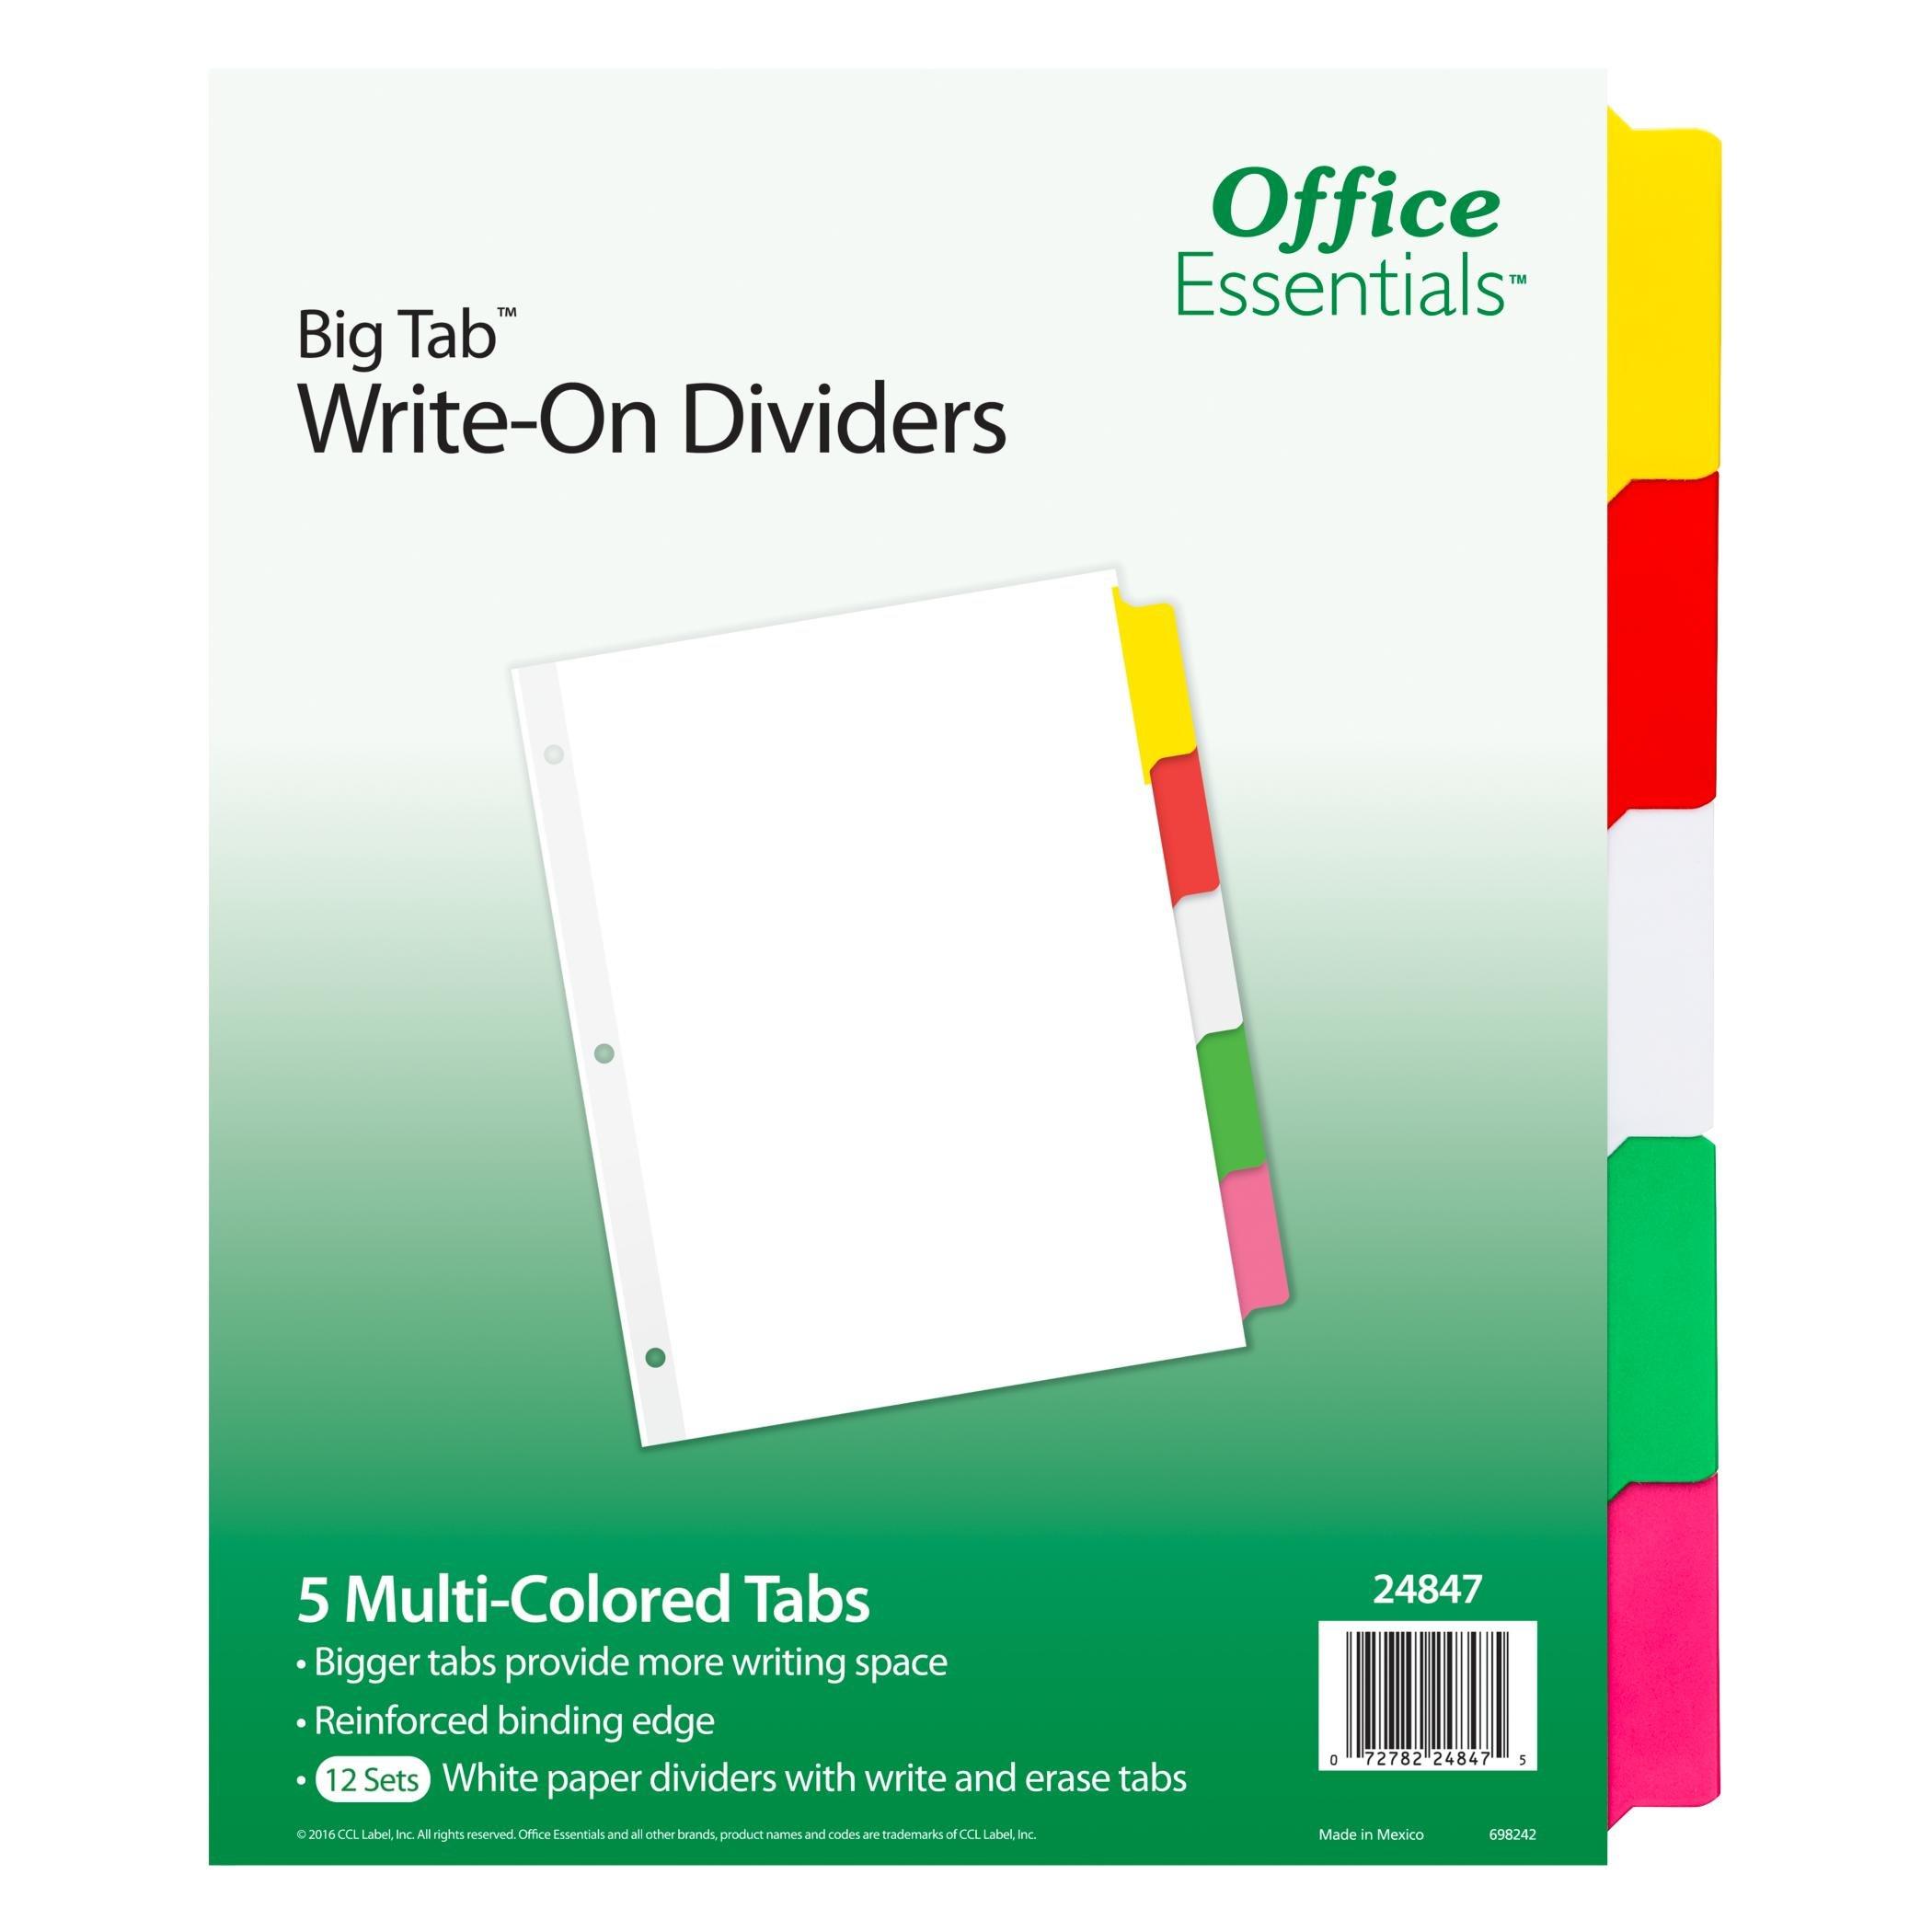 Office Essentials Big Tab Write-On Dividers, 8-1/2'' x 11'', 5 Tab, Multicolor Tab, 12 Sets (24847)